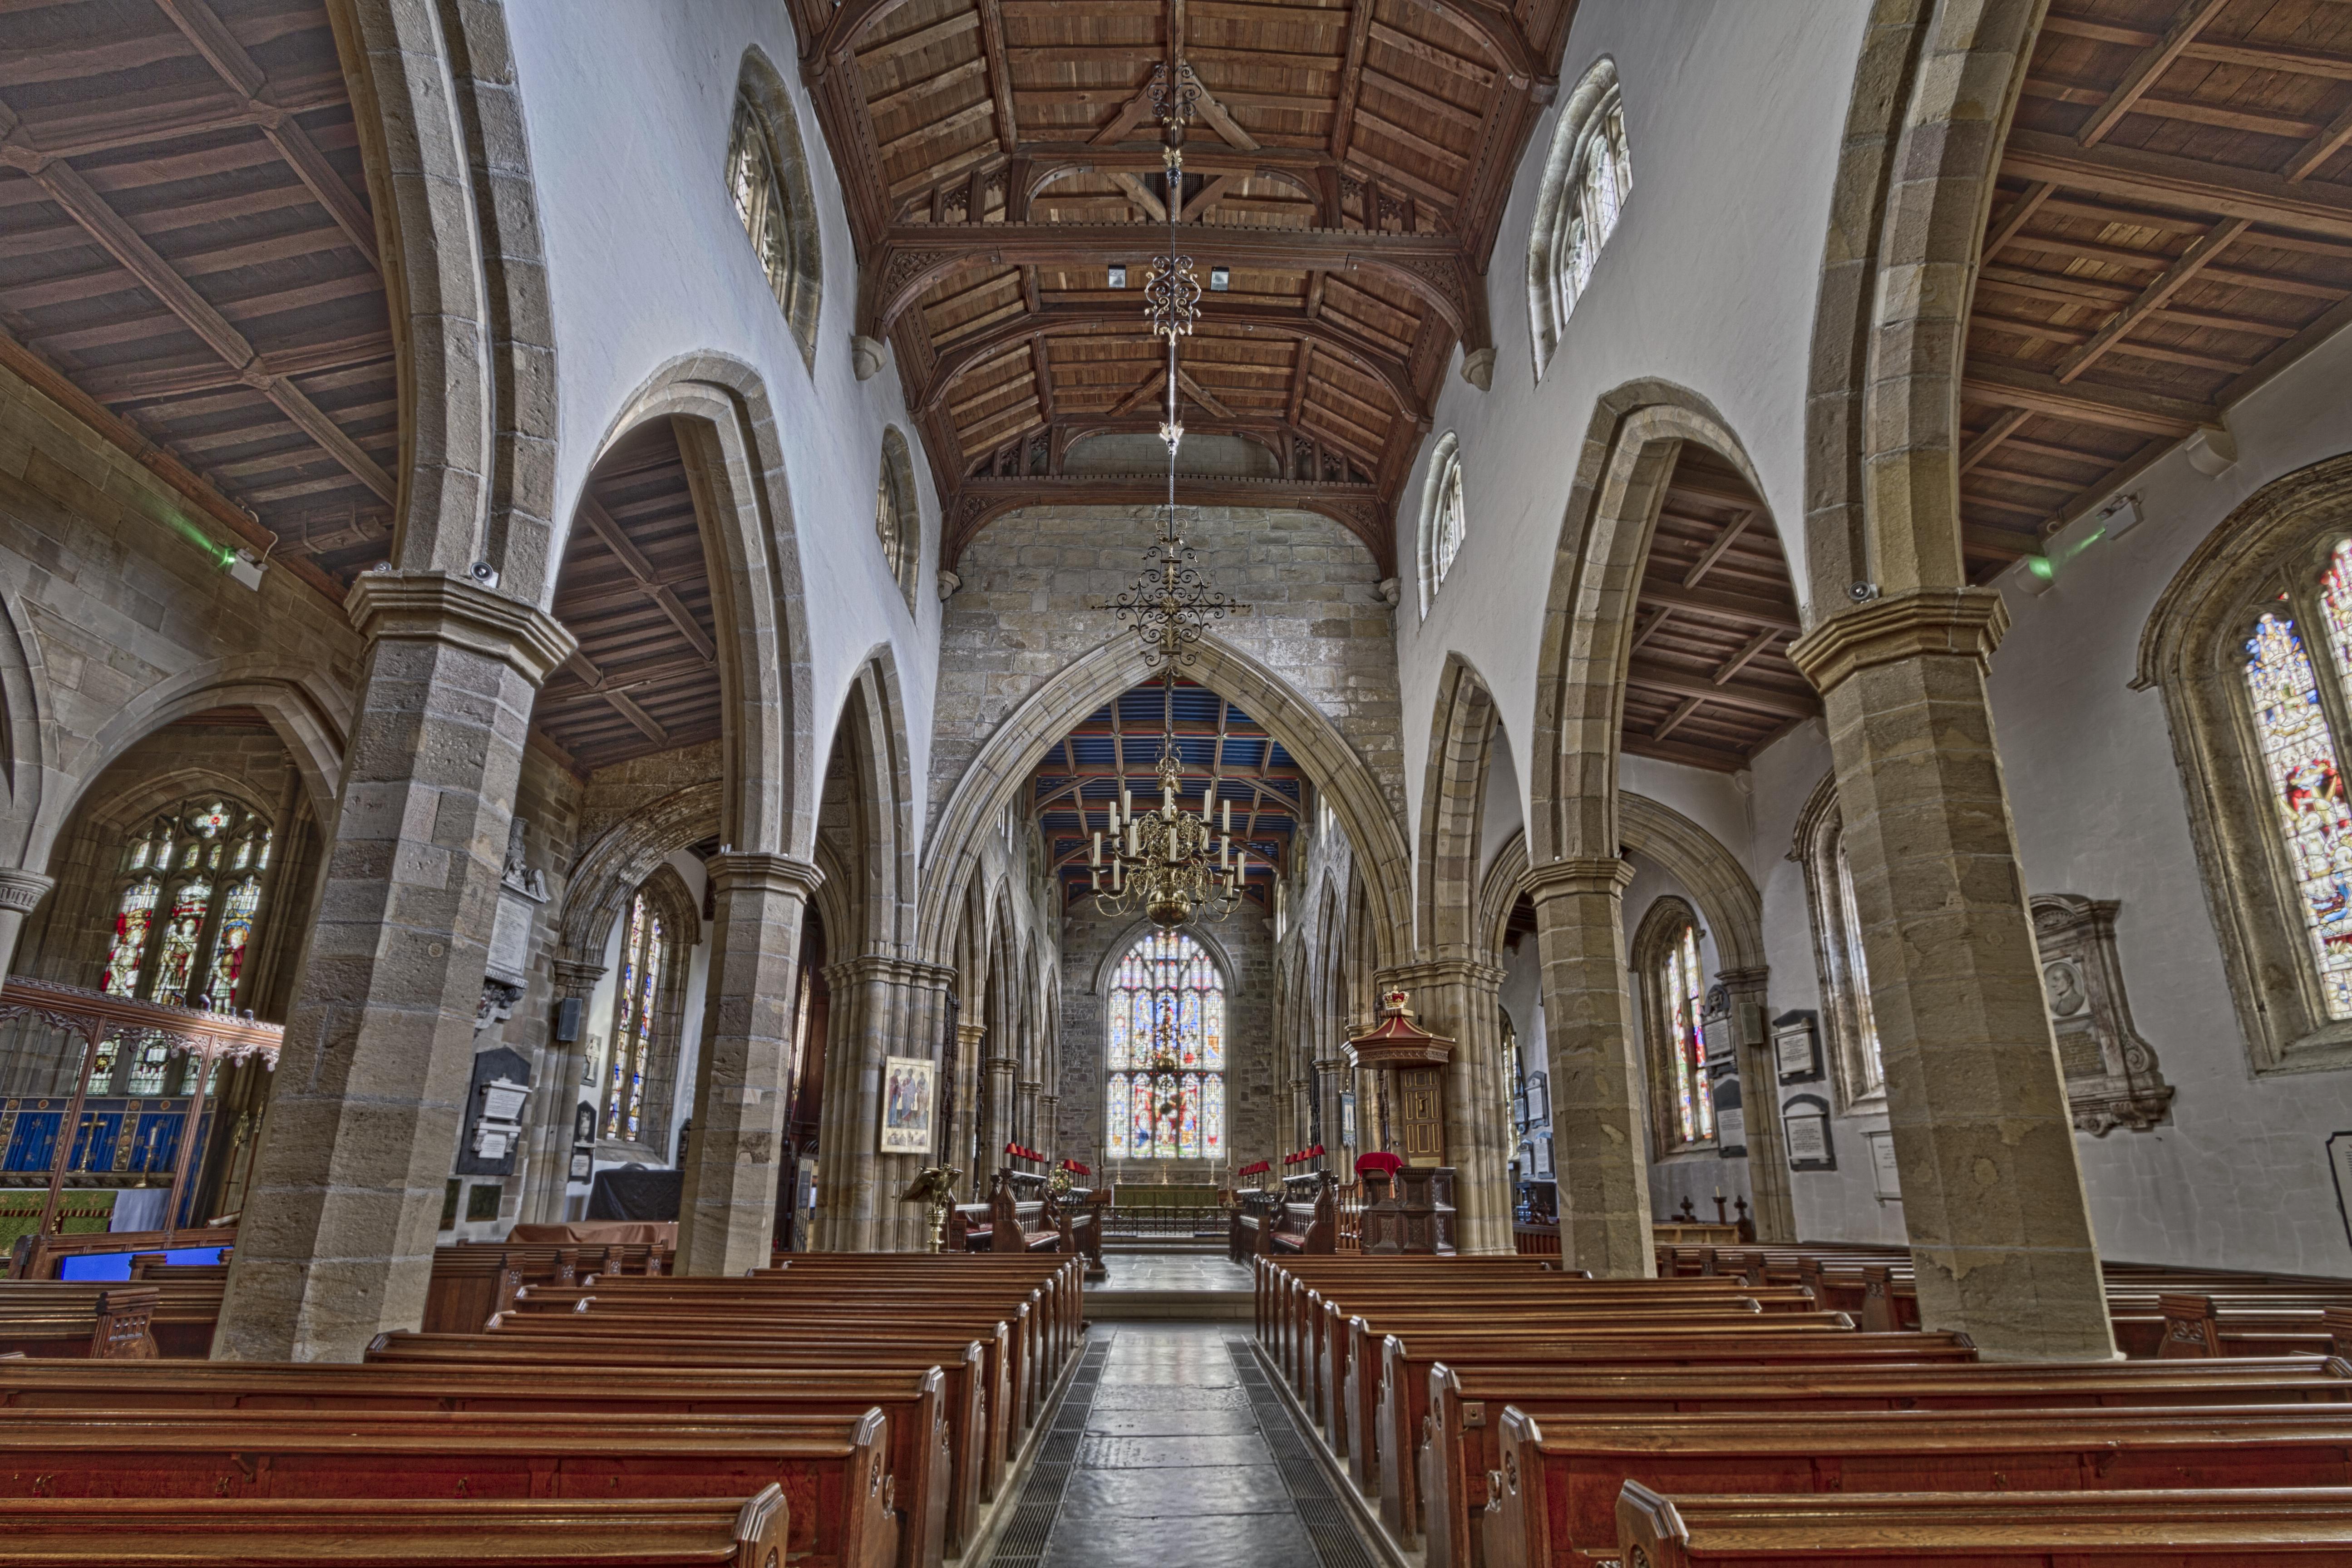 Lancaster_Priory_(12644071125)